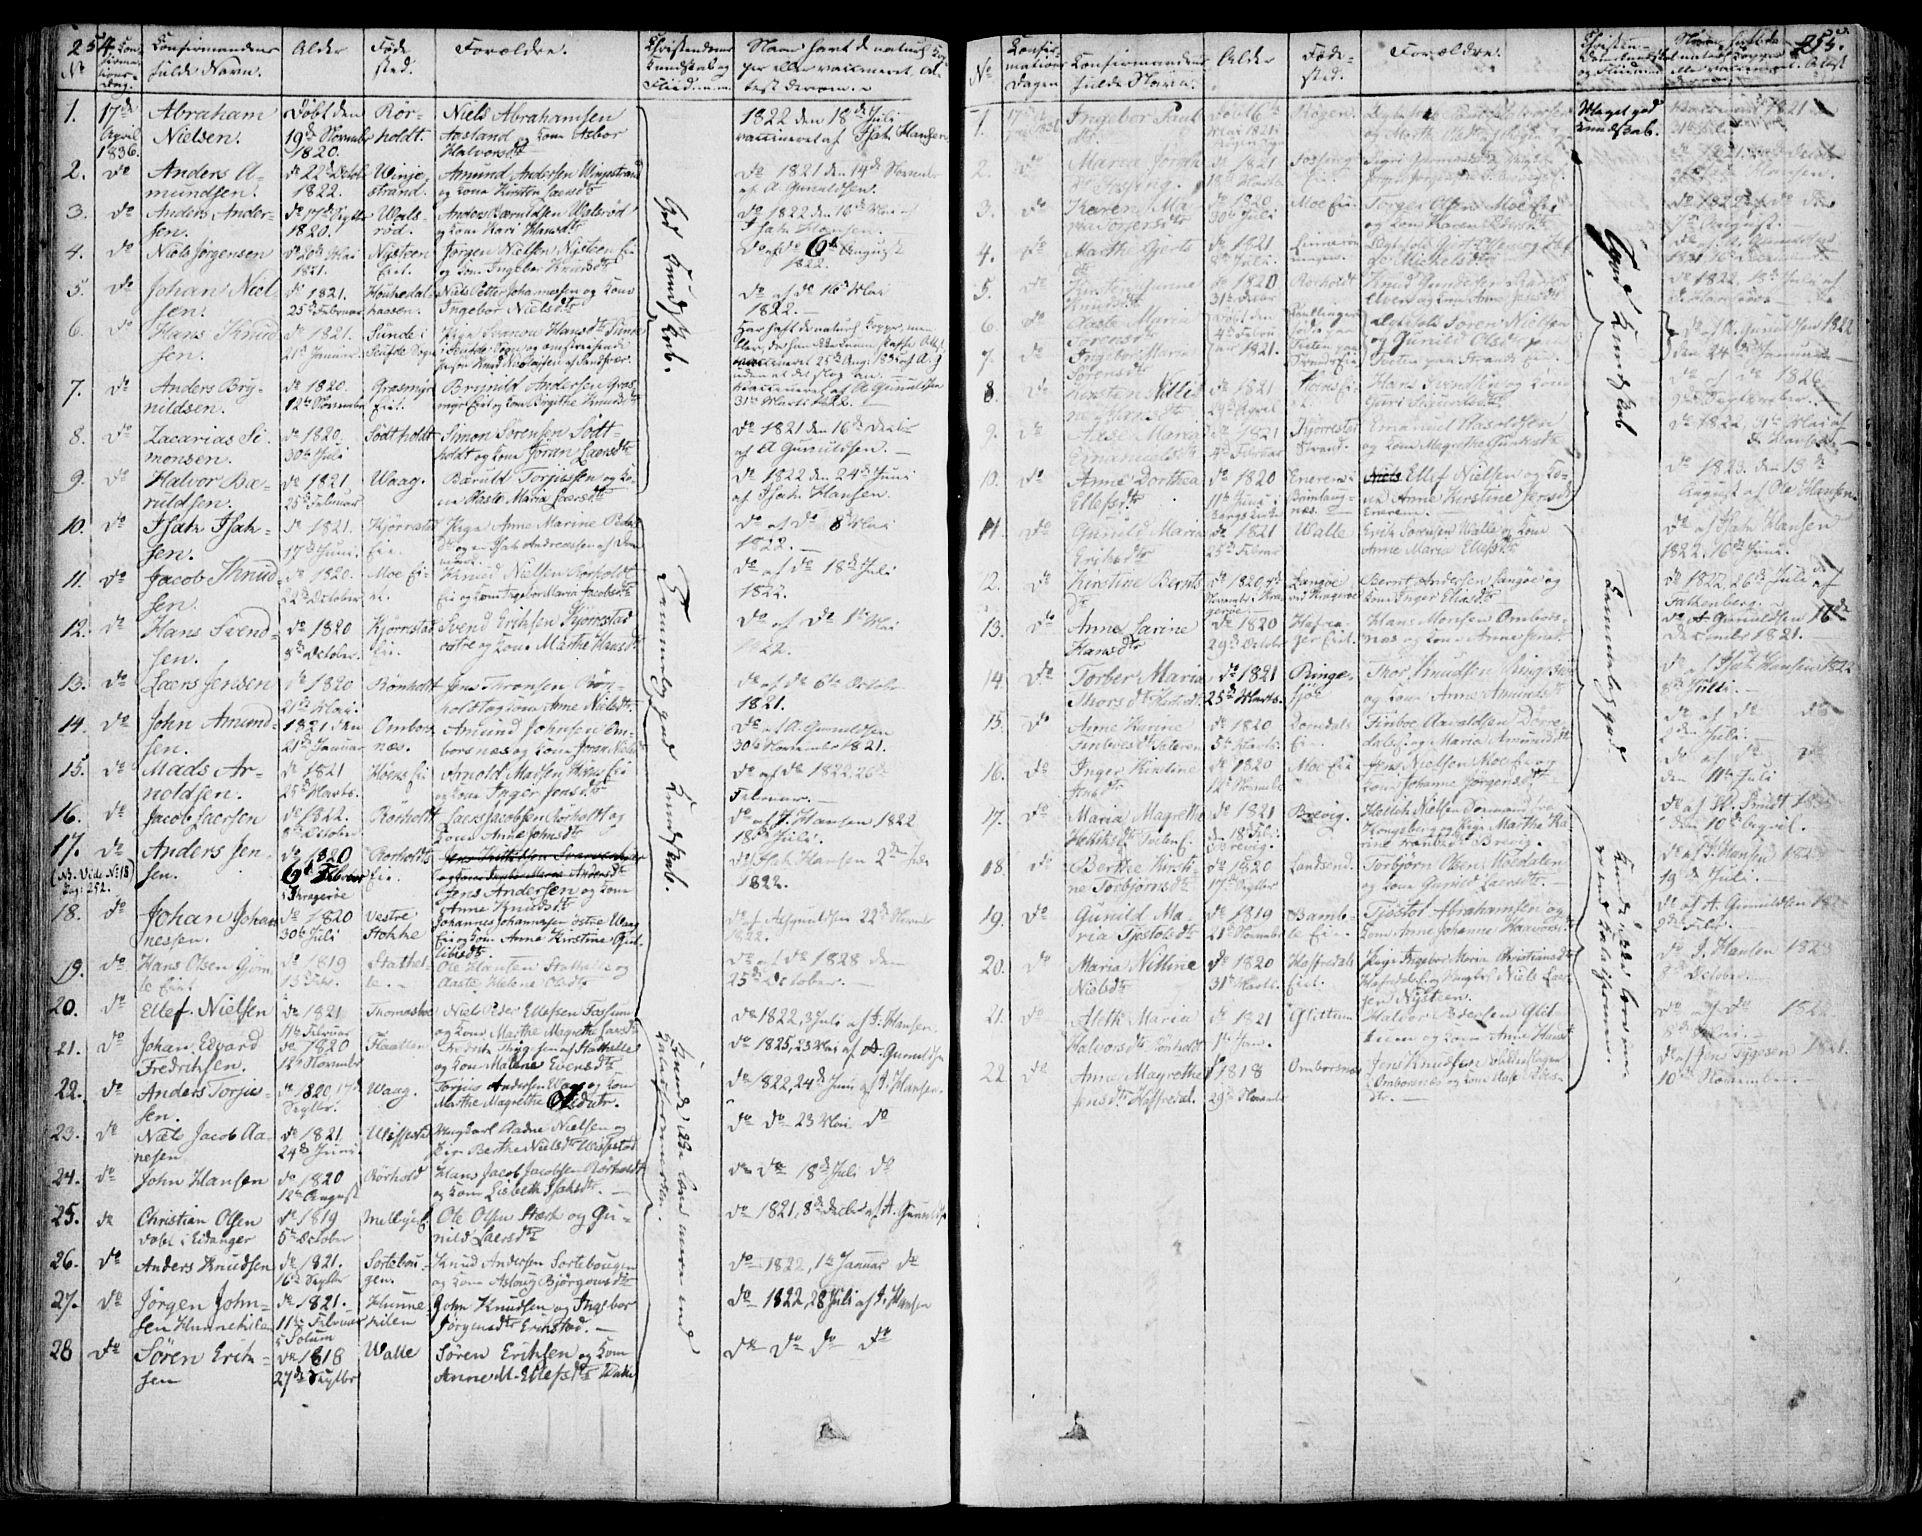 SAKO, Bamble kirkebøker, F/Fa/L0004: Ministerialbok nr. I 4, 1834-1853, s. 254-255